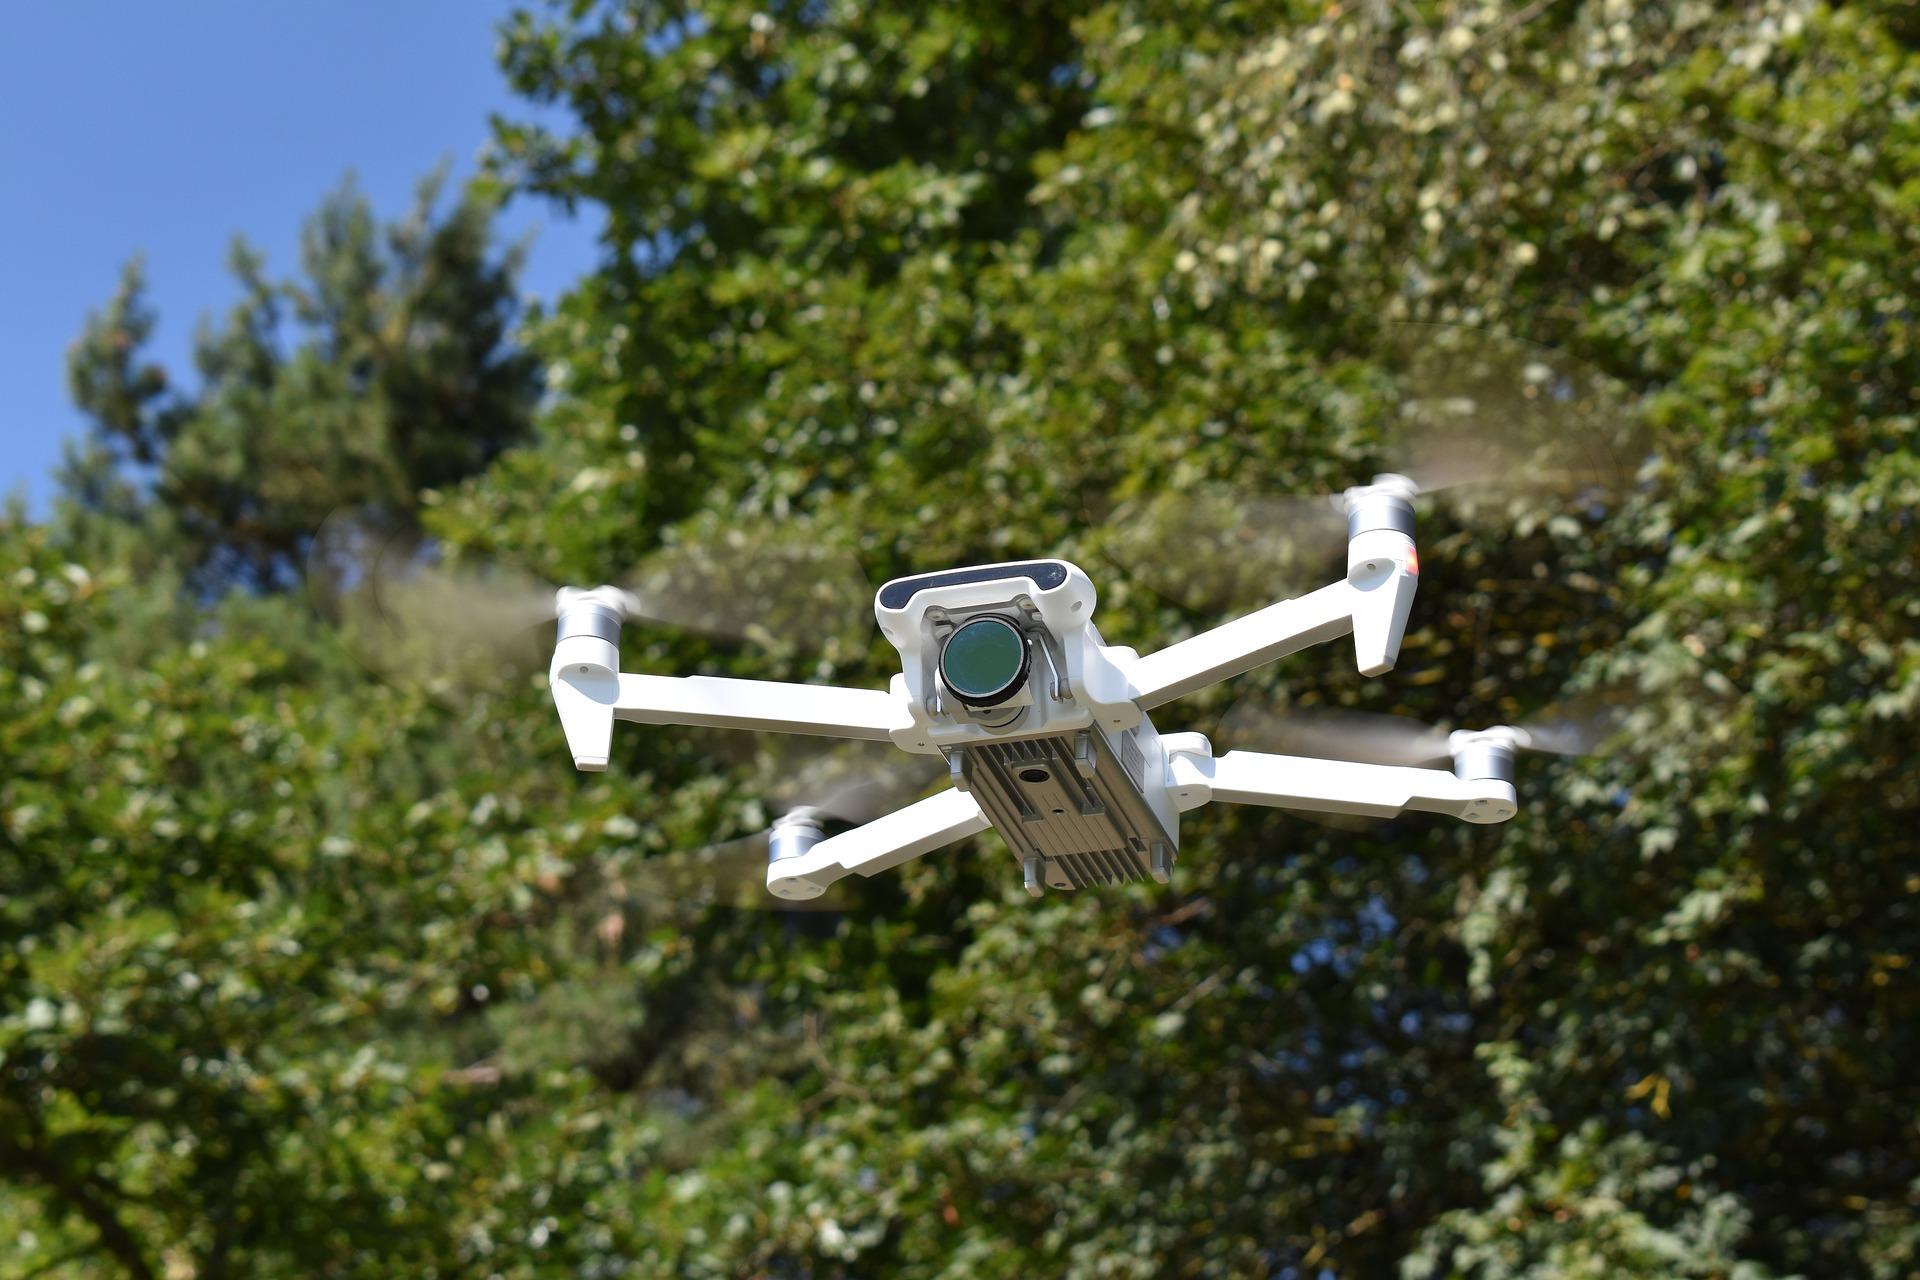 drone-5115739_1920.jpg